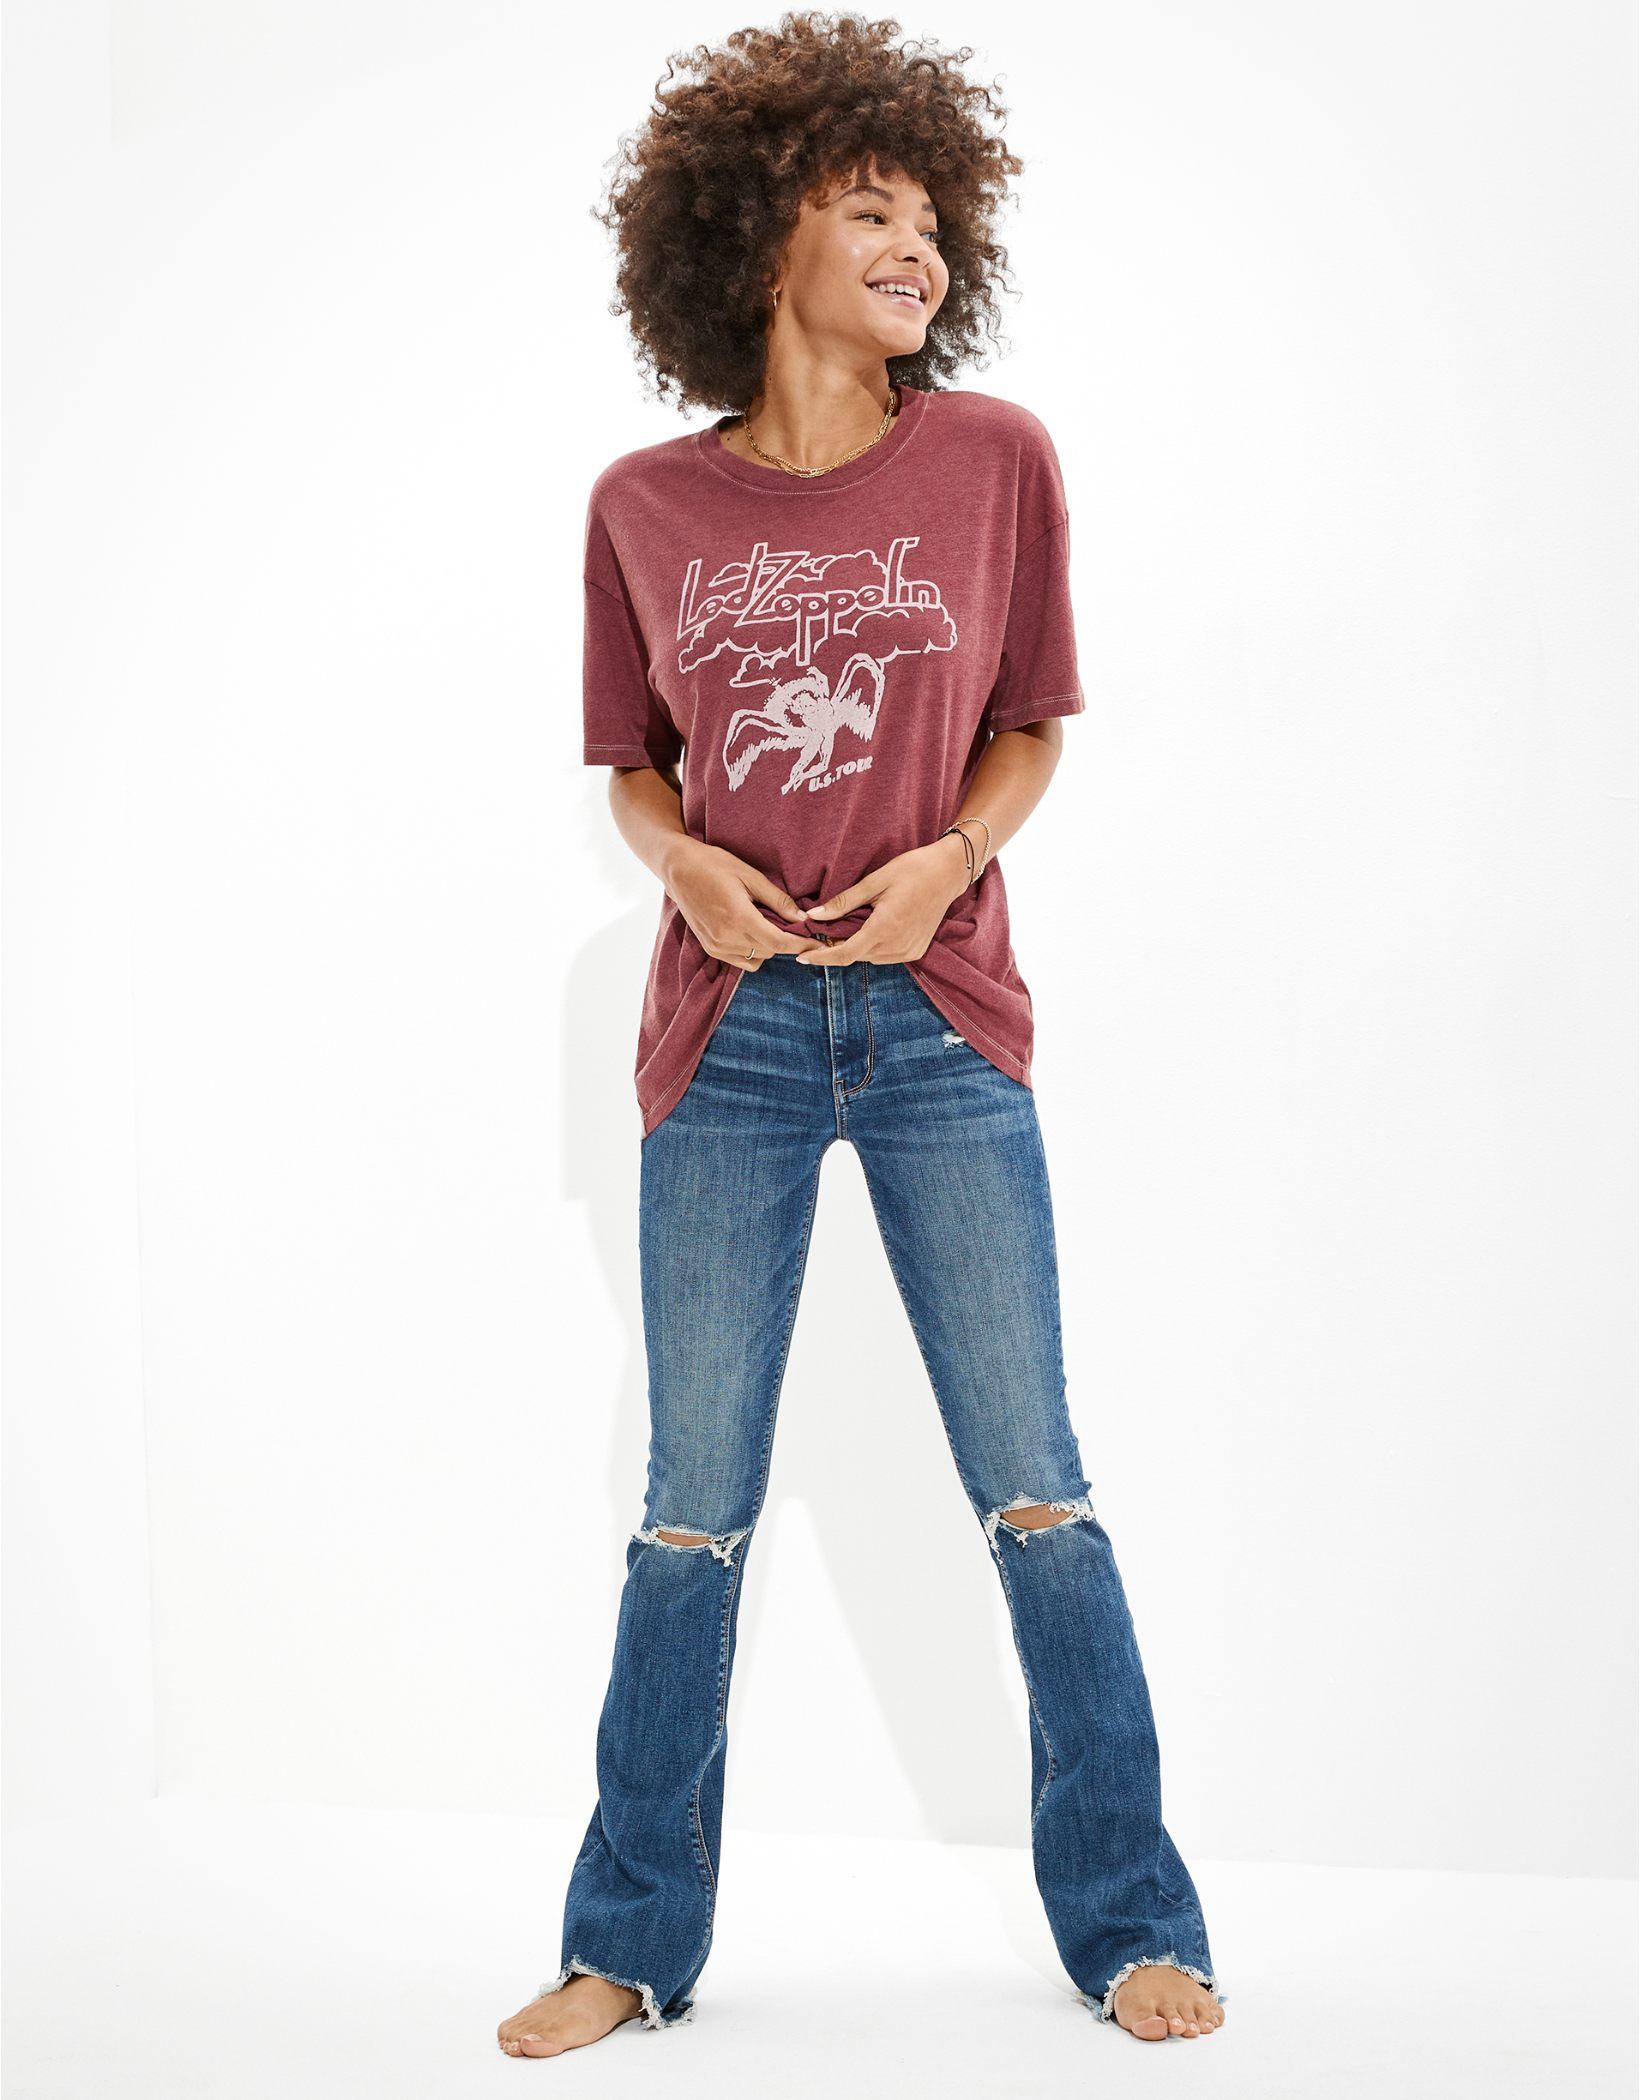 AE Oversized Led Zeppelin Graphic T-Shirt